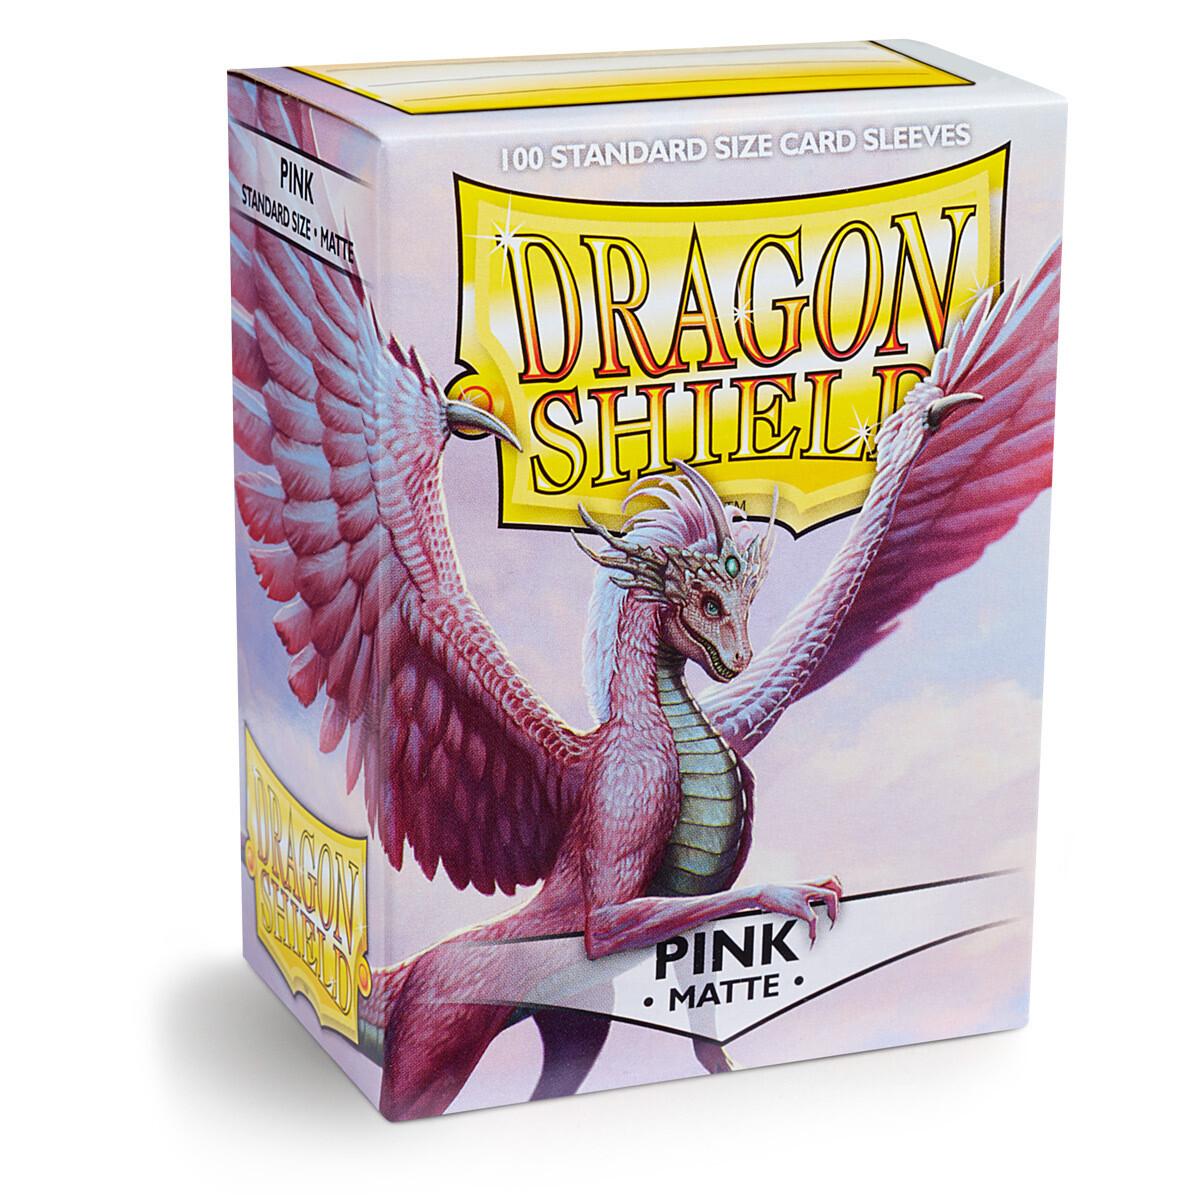 Dragon Shield 100 Sleeves - Matte Pink